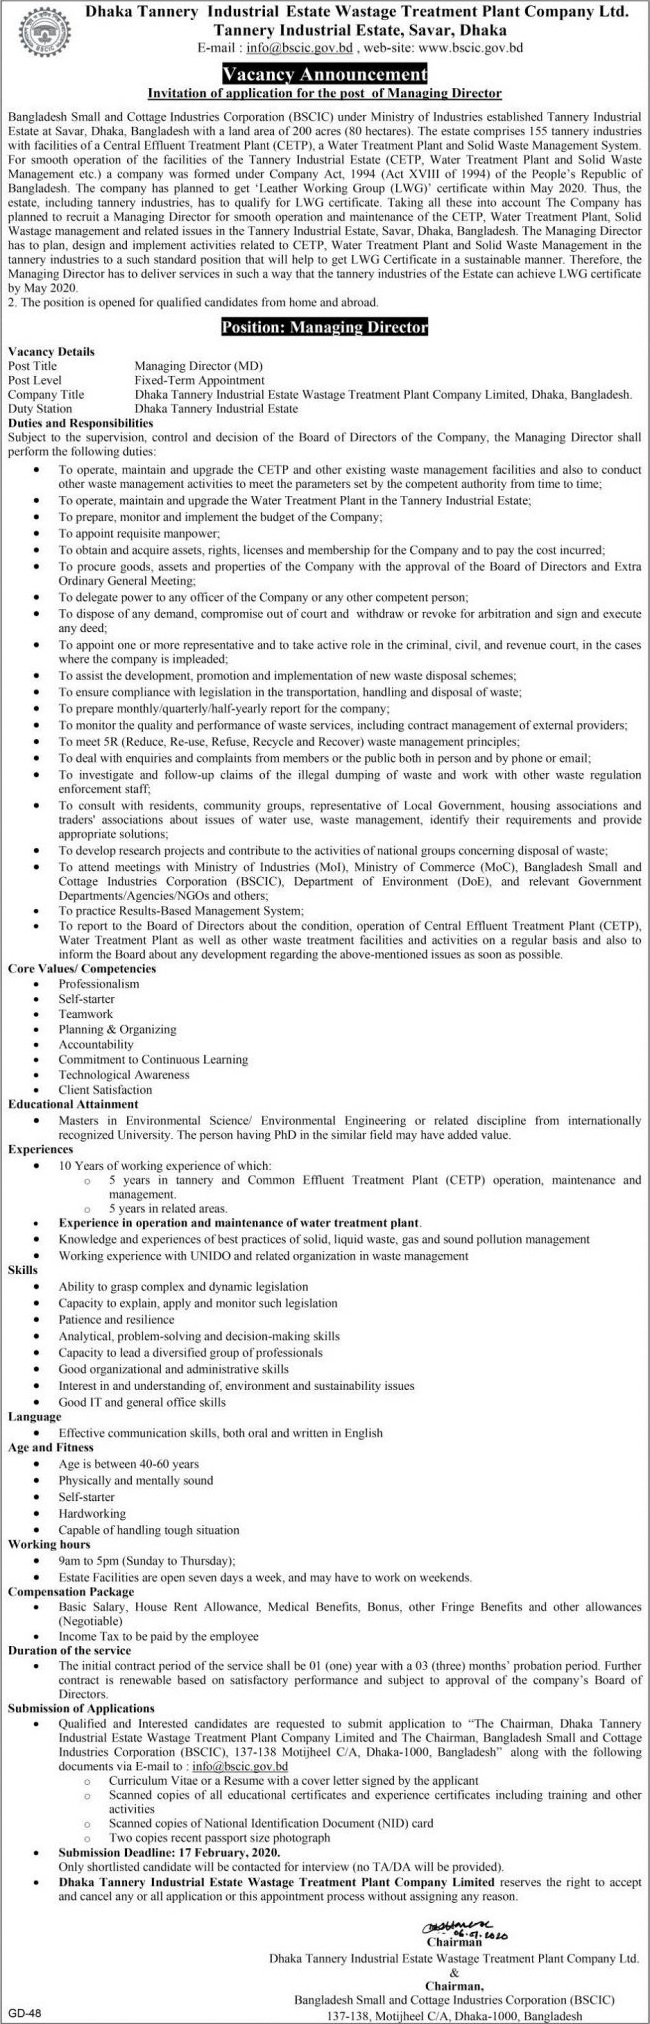 Bangladesh Small and Cottage Industries Corporation Job Circular 2020